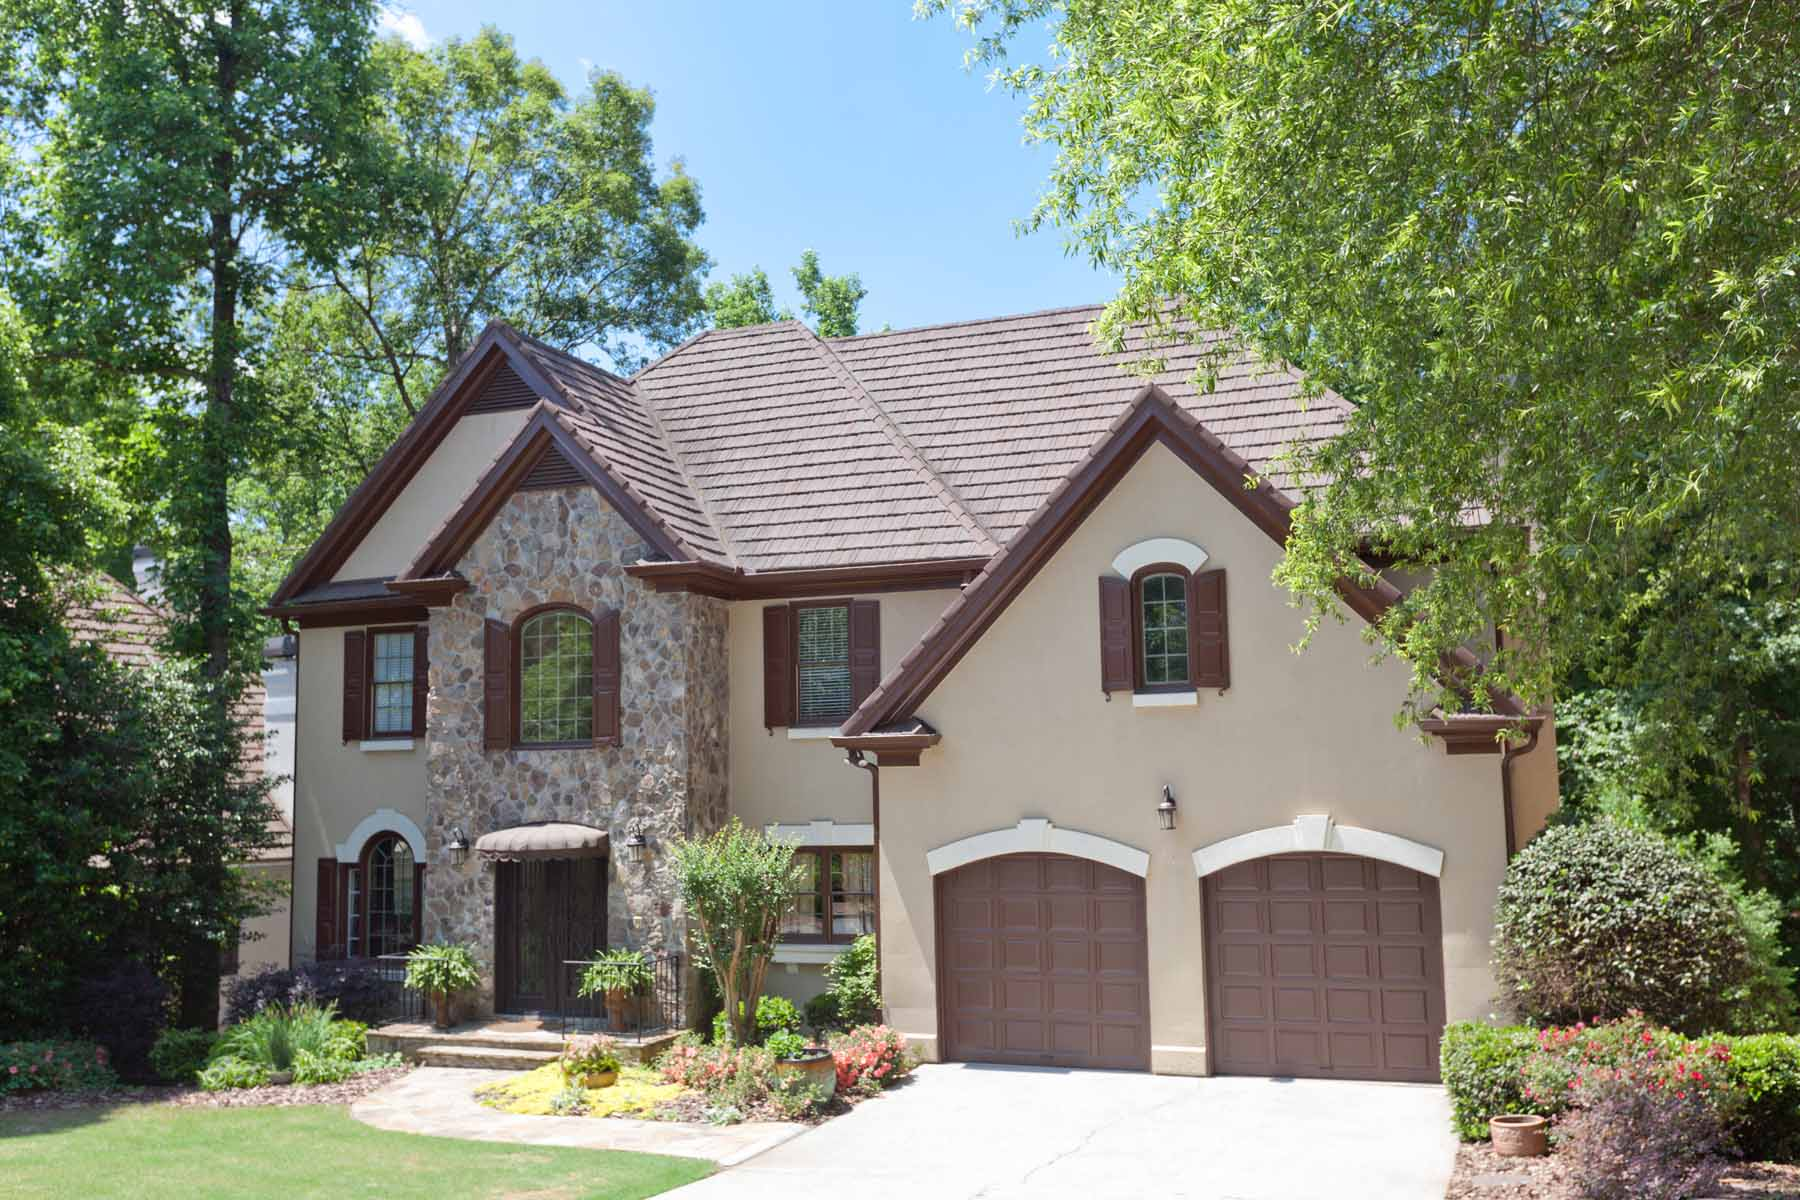 独户住宅 为 销售 在 Country Club of the South 2020 Compton Way Johns Creek, 乔治亚州 30022 美国